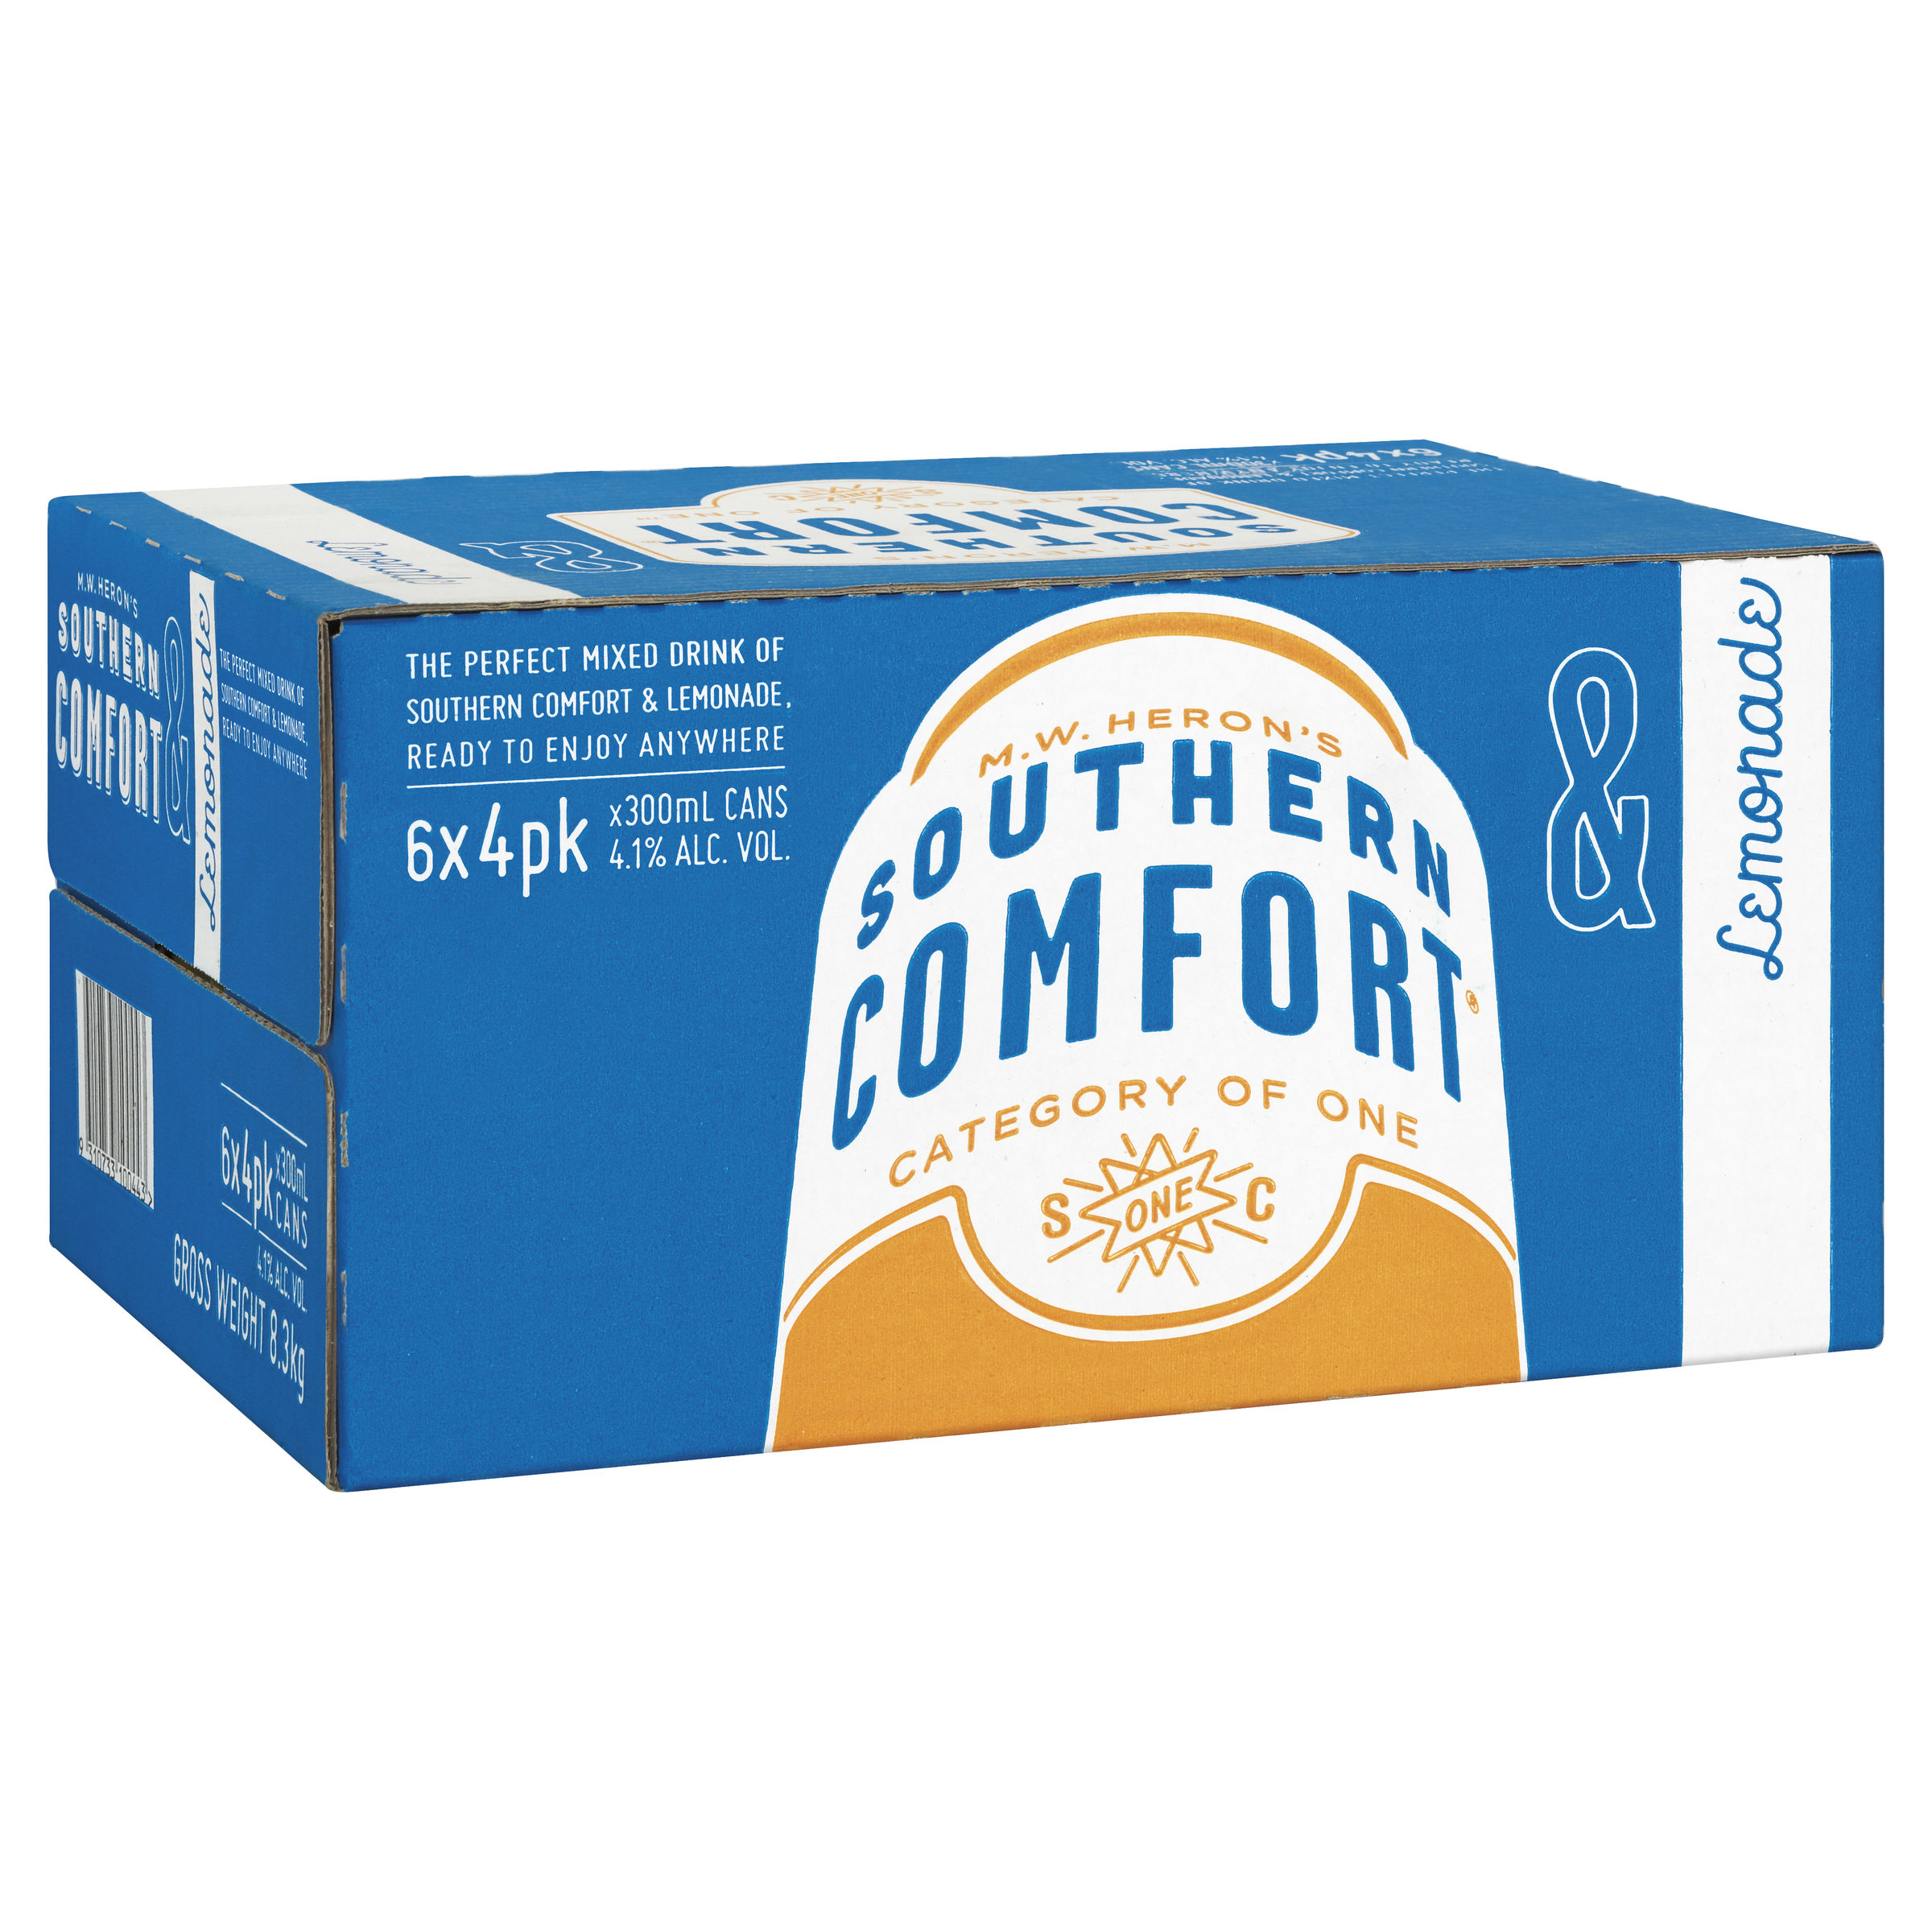 SOUTHERN COMFORT & LEMONADE CAN